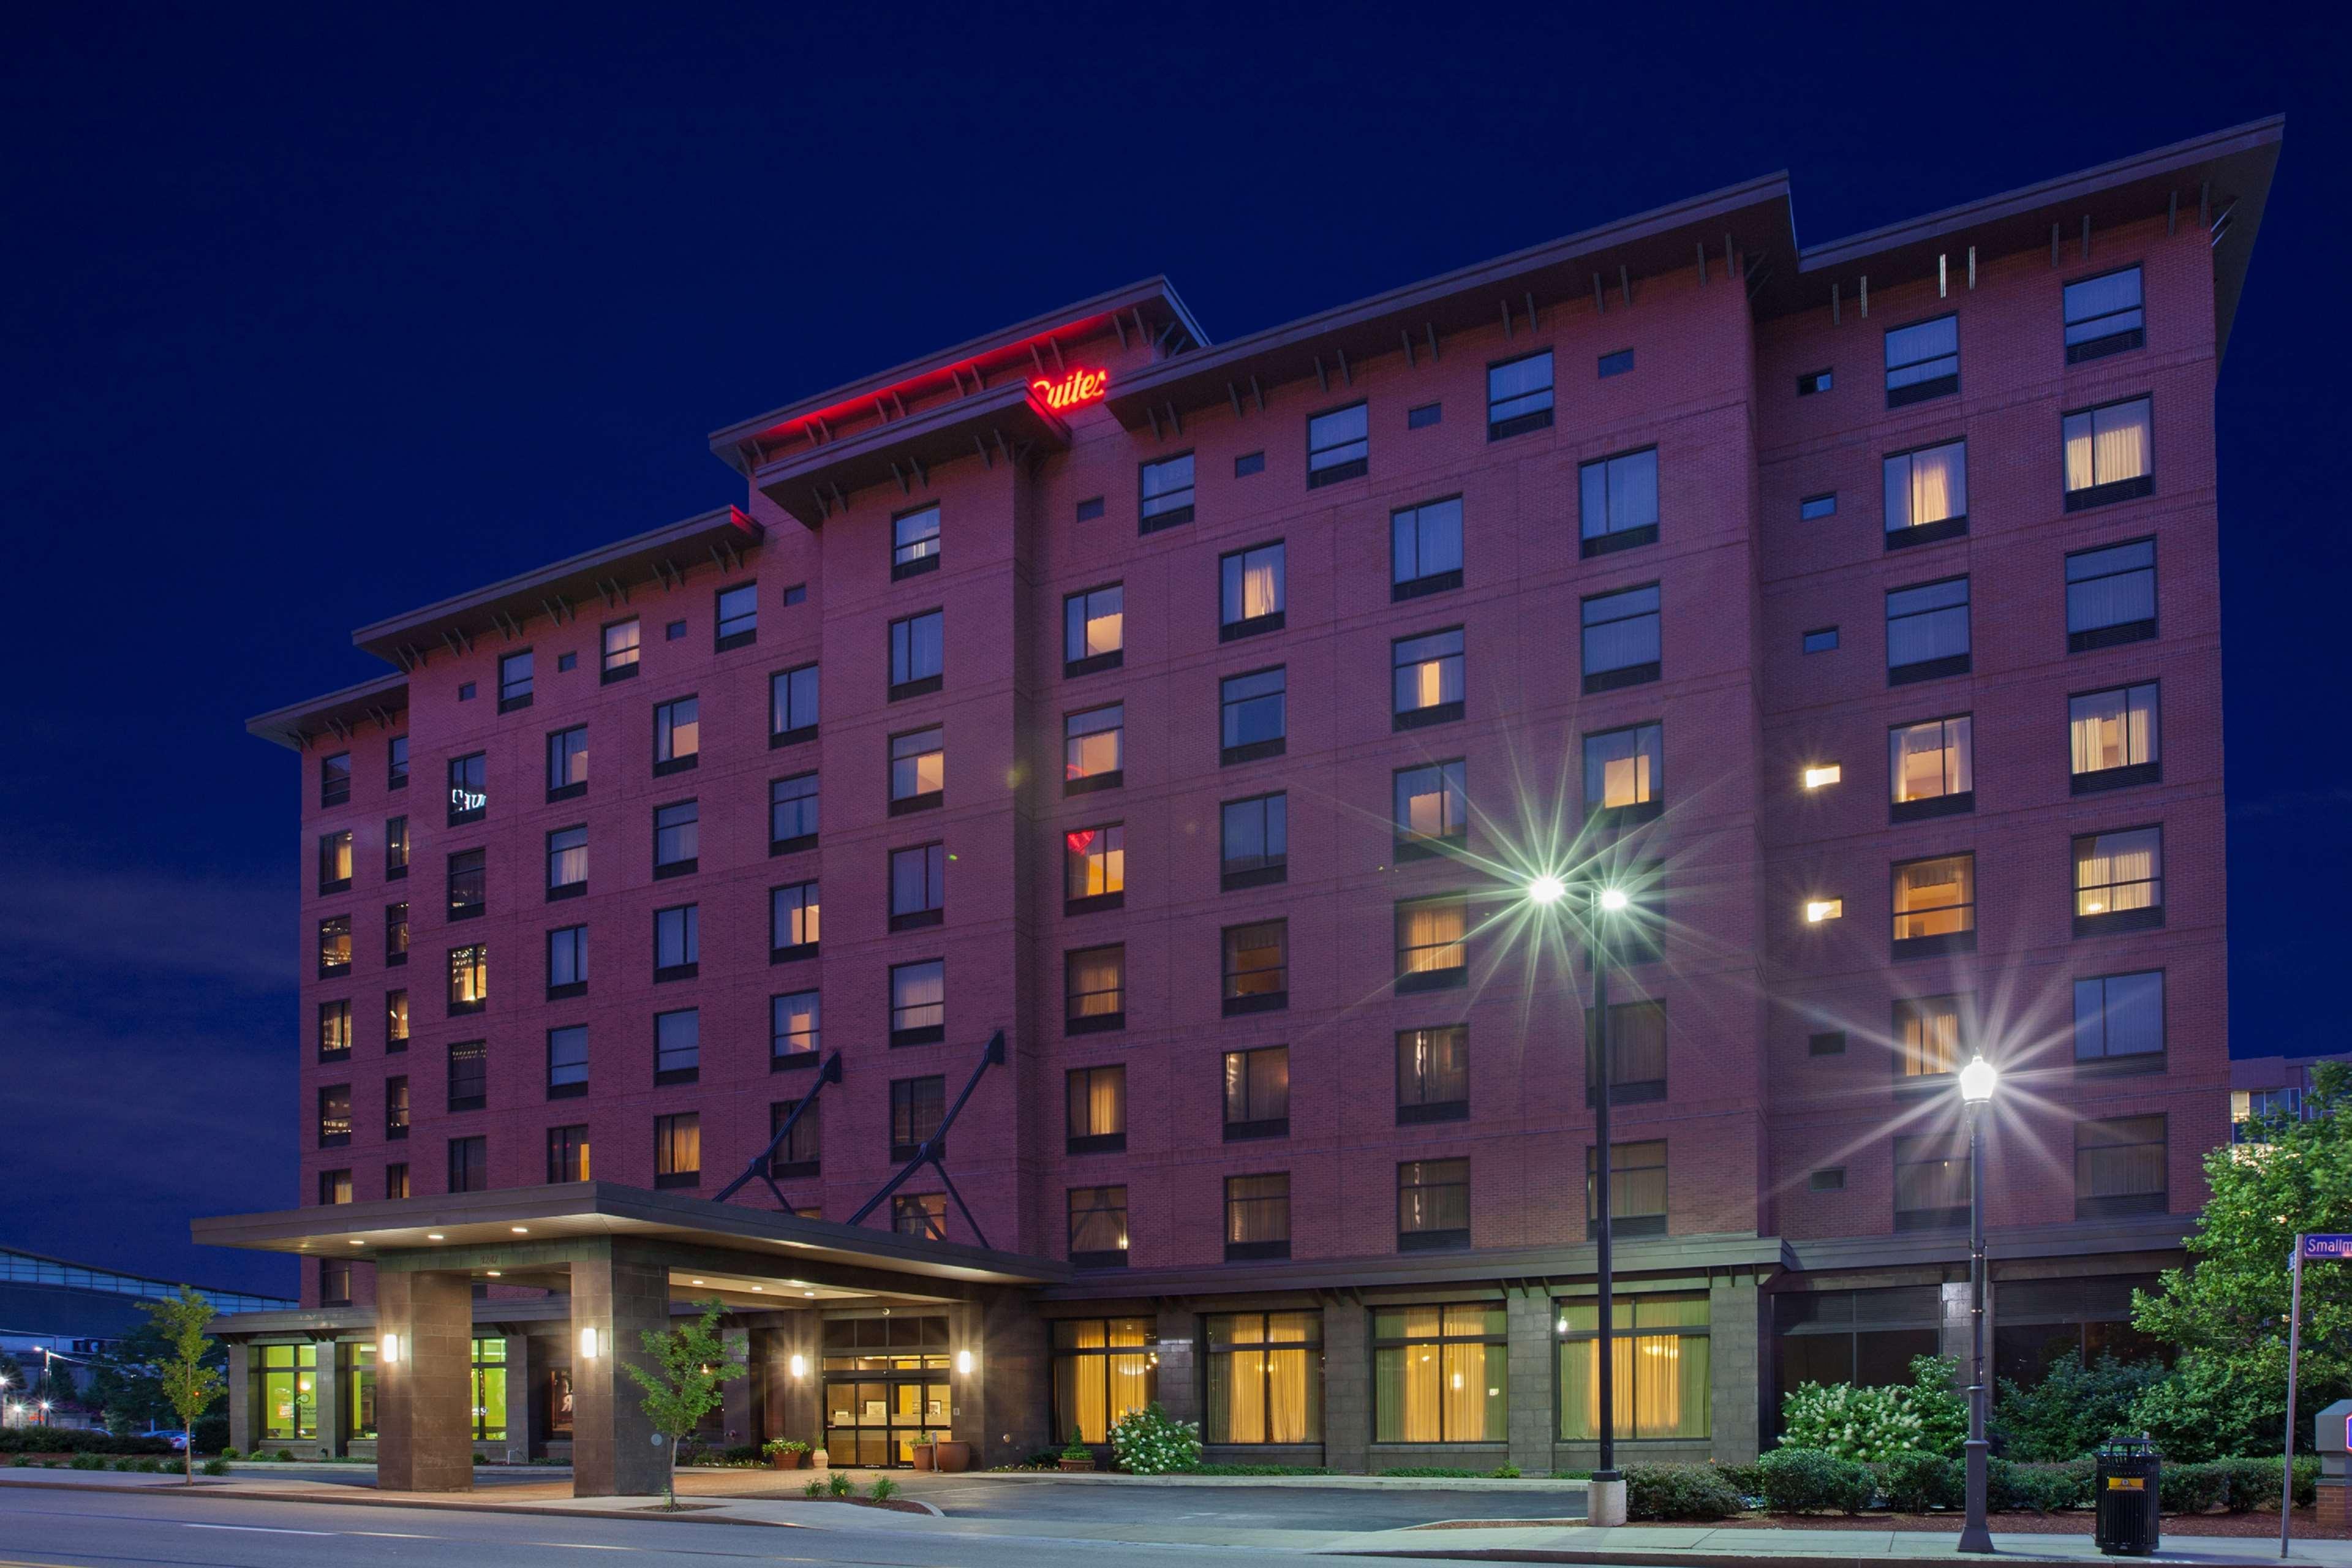 Hampton Inn & Suites Pittsburgh-Downtown image 3